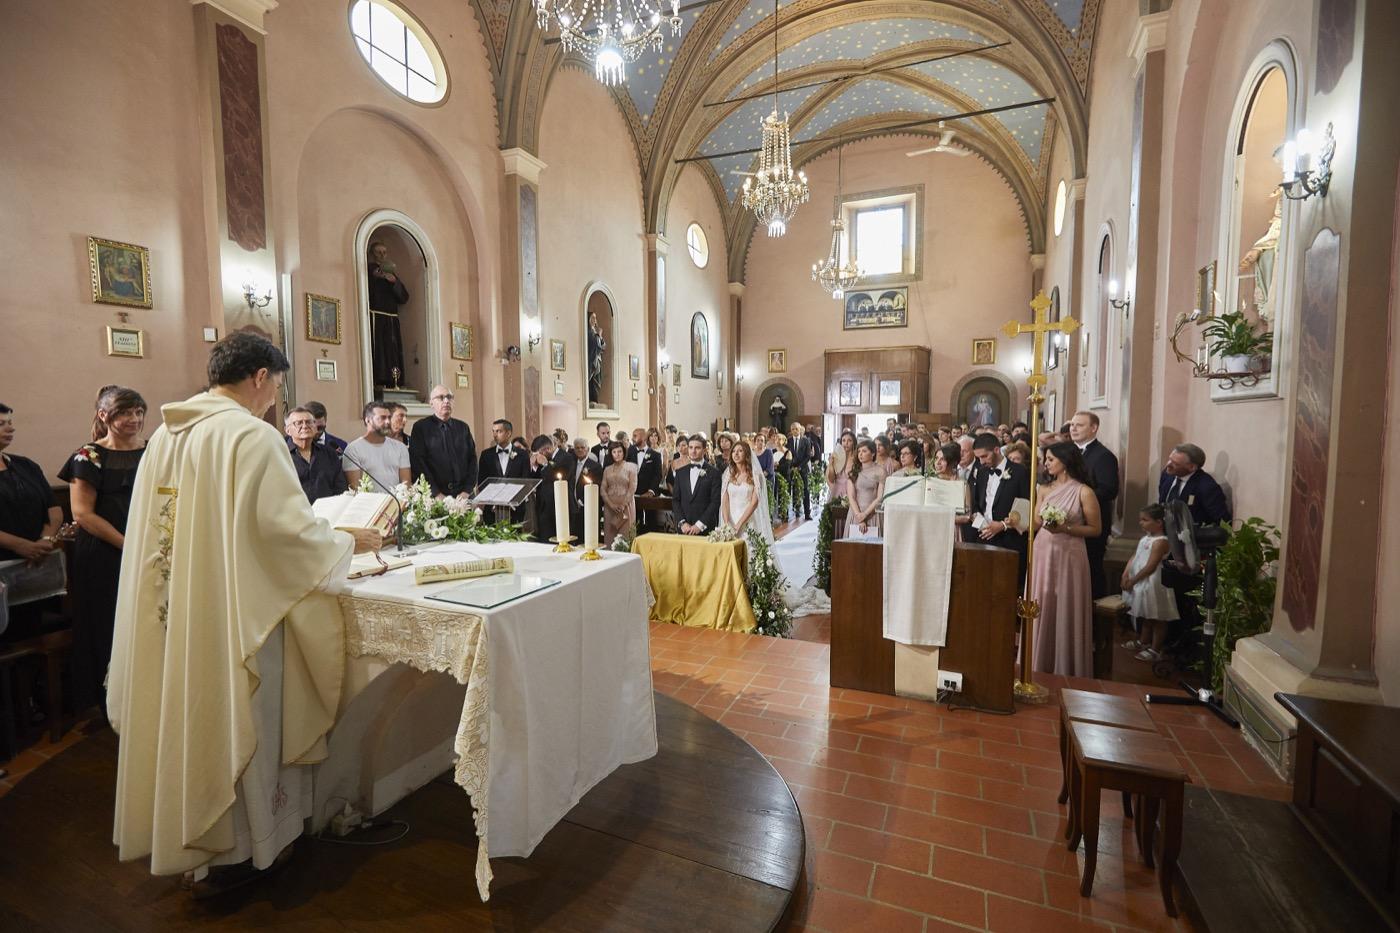 Claudio-Coppola-wedding-photographer-abbazia-7-frati-piegaro-43